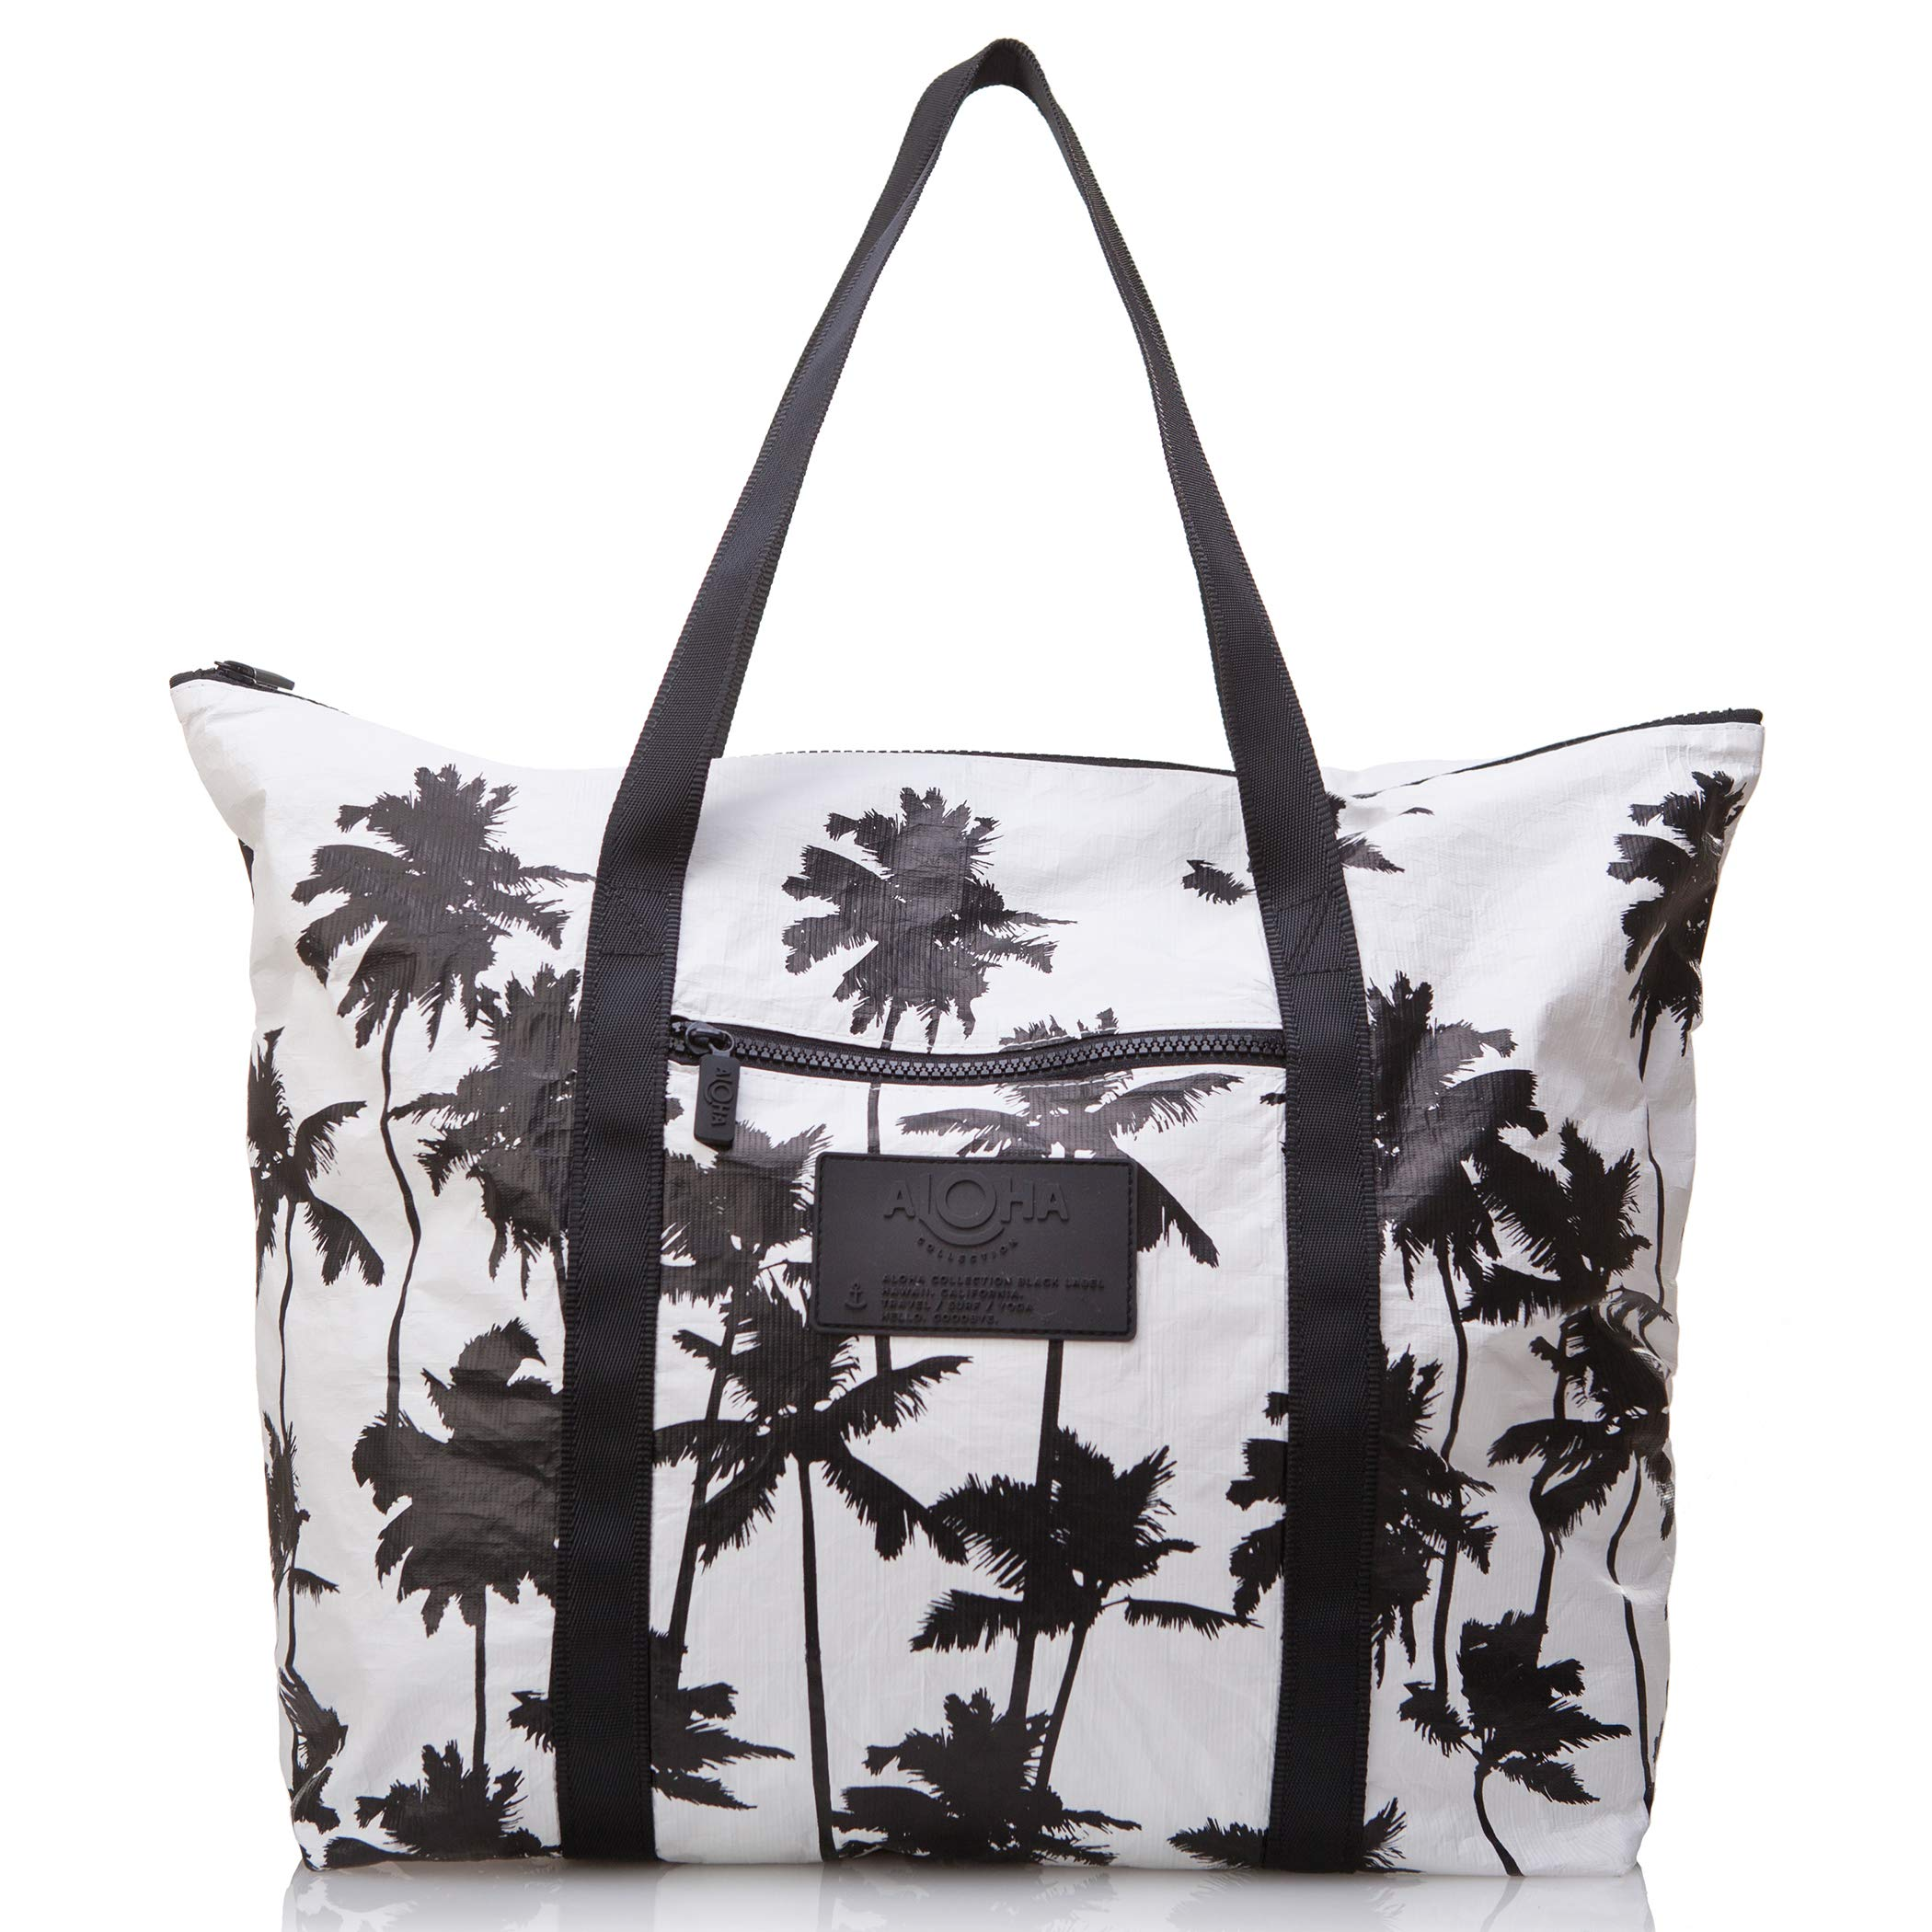 ALOHA Collection Coco Palms Zipper Tote in Black